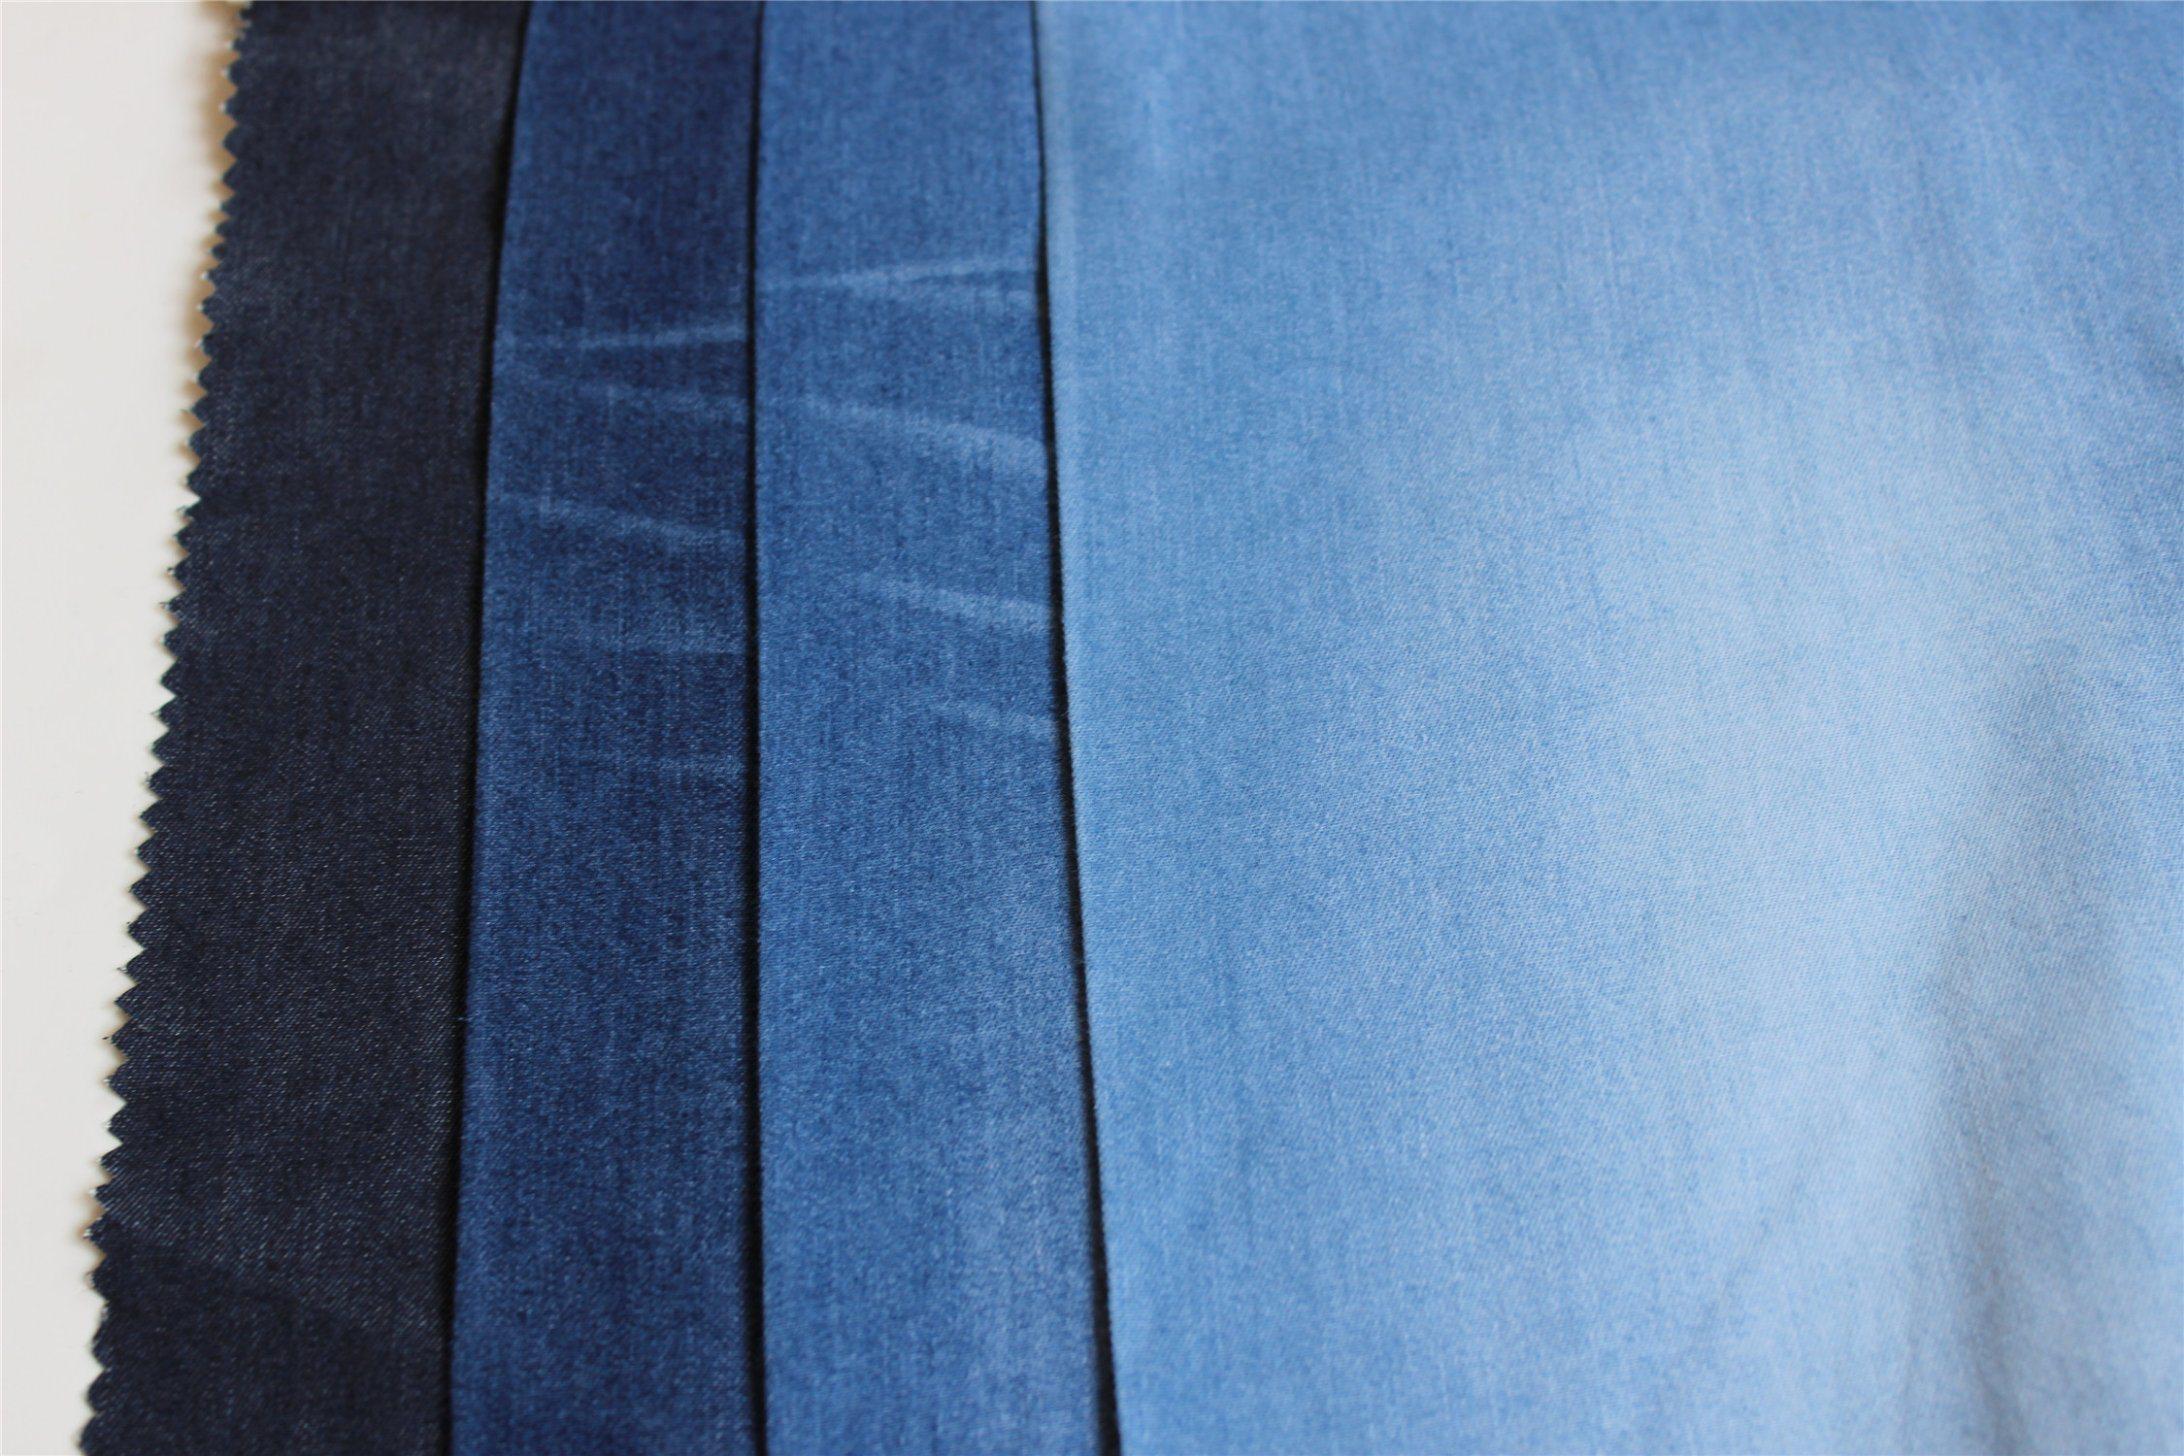 Tencel Cotton Denim For T-Shirt